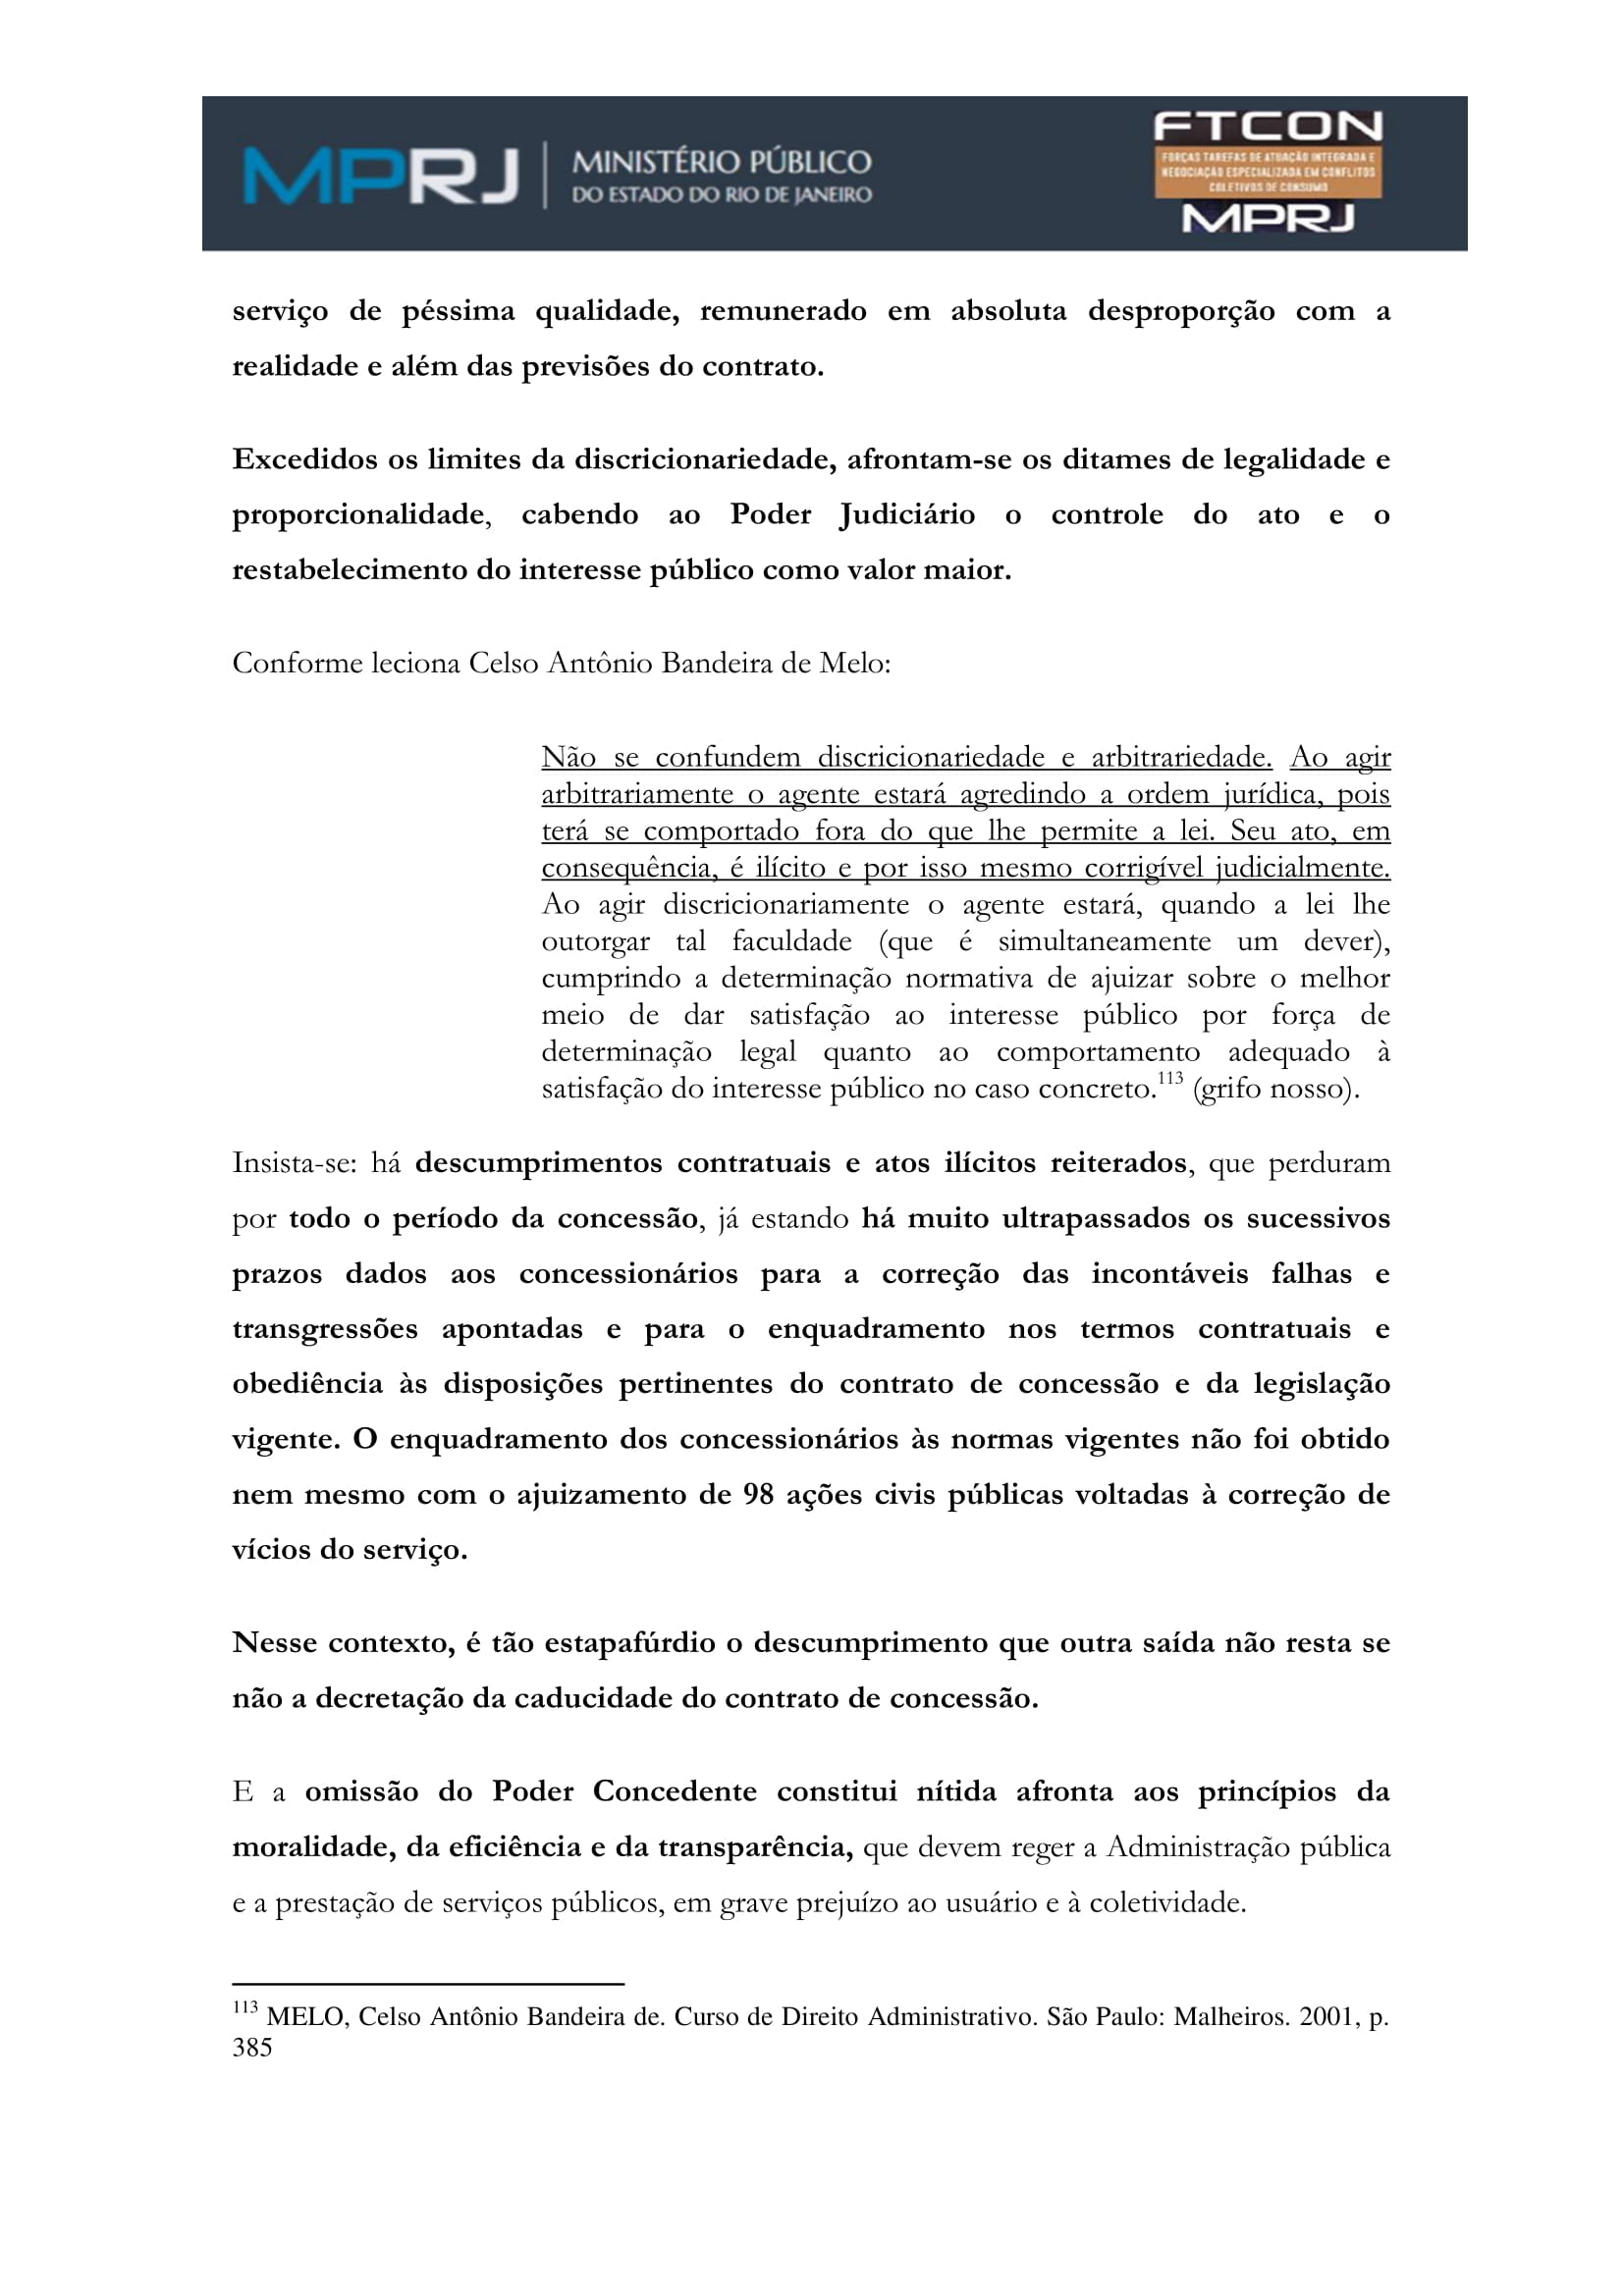 acp_caducidade_onibus_dr_rt-122